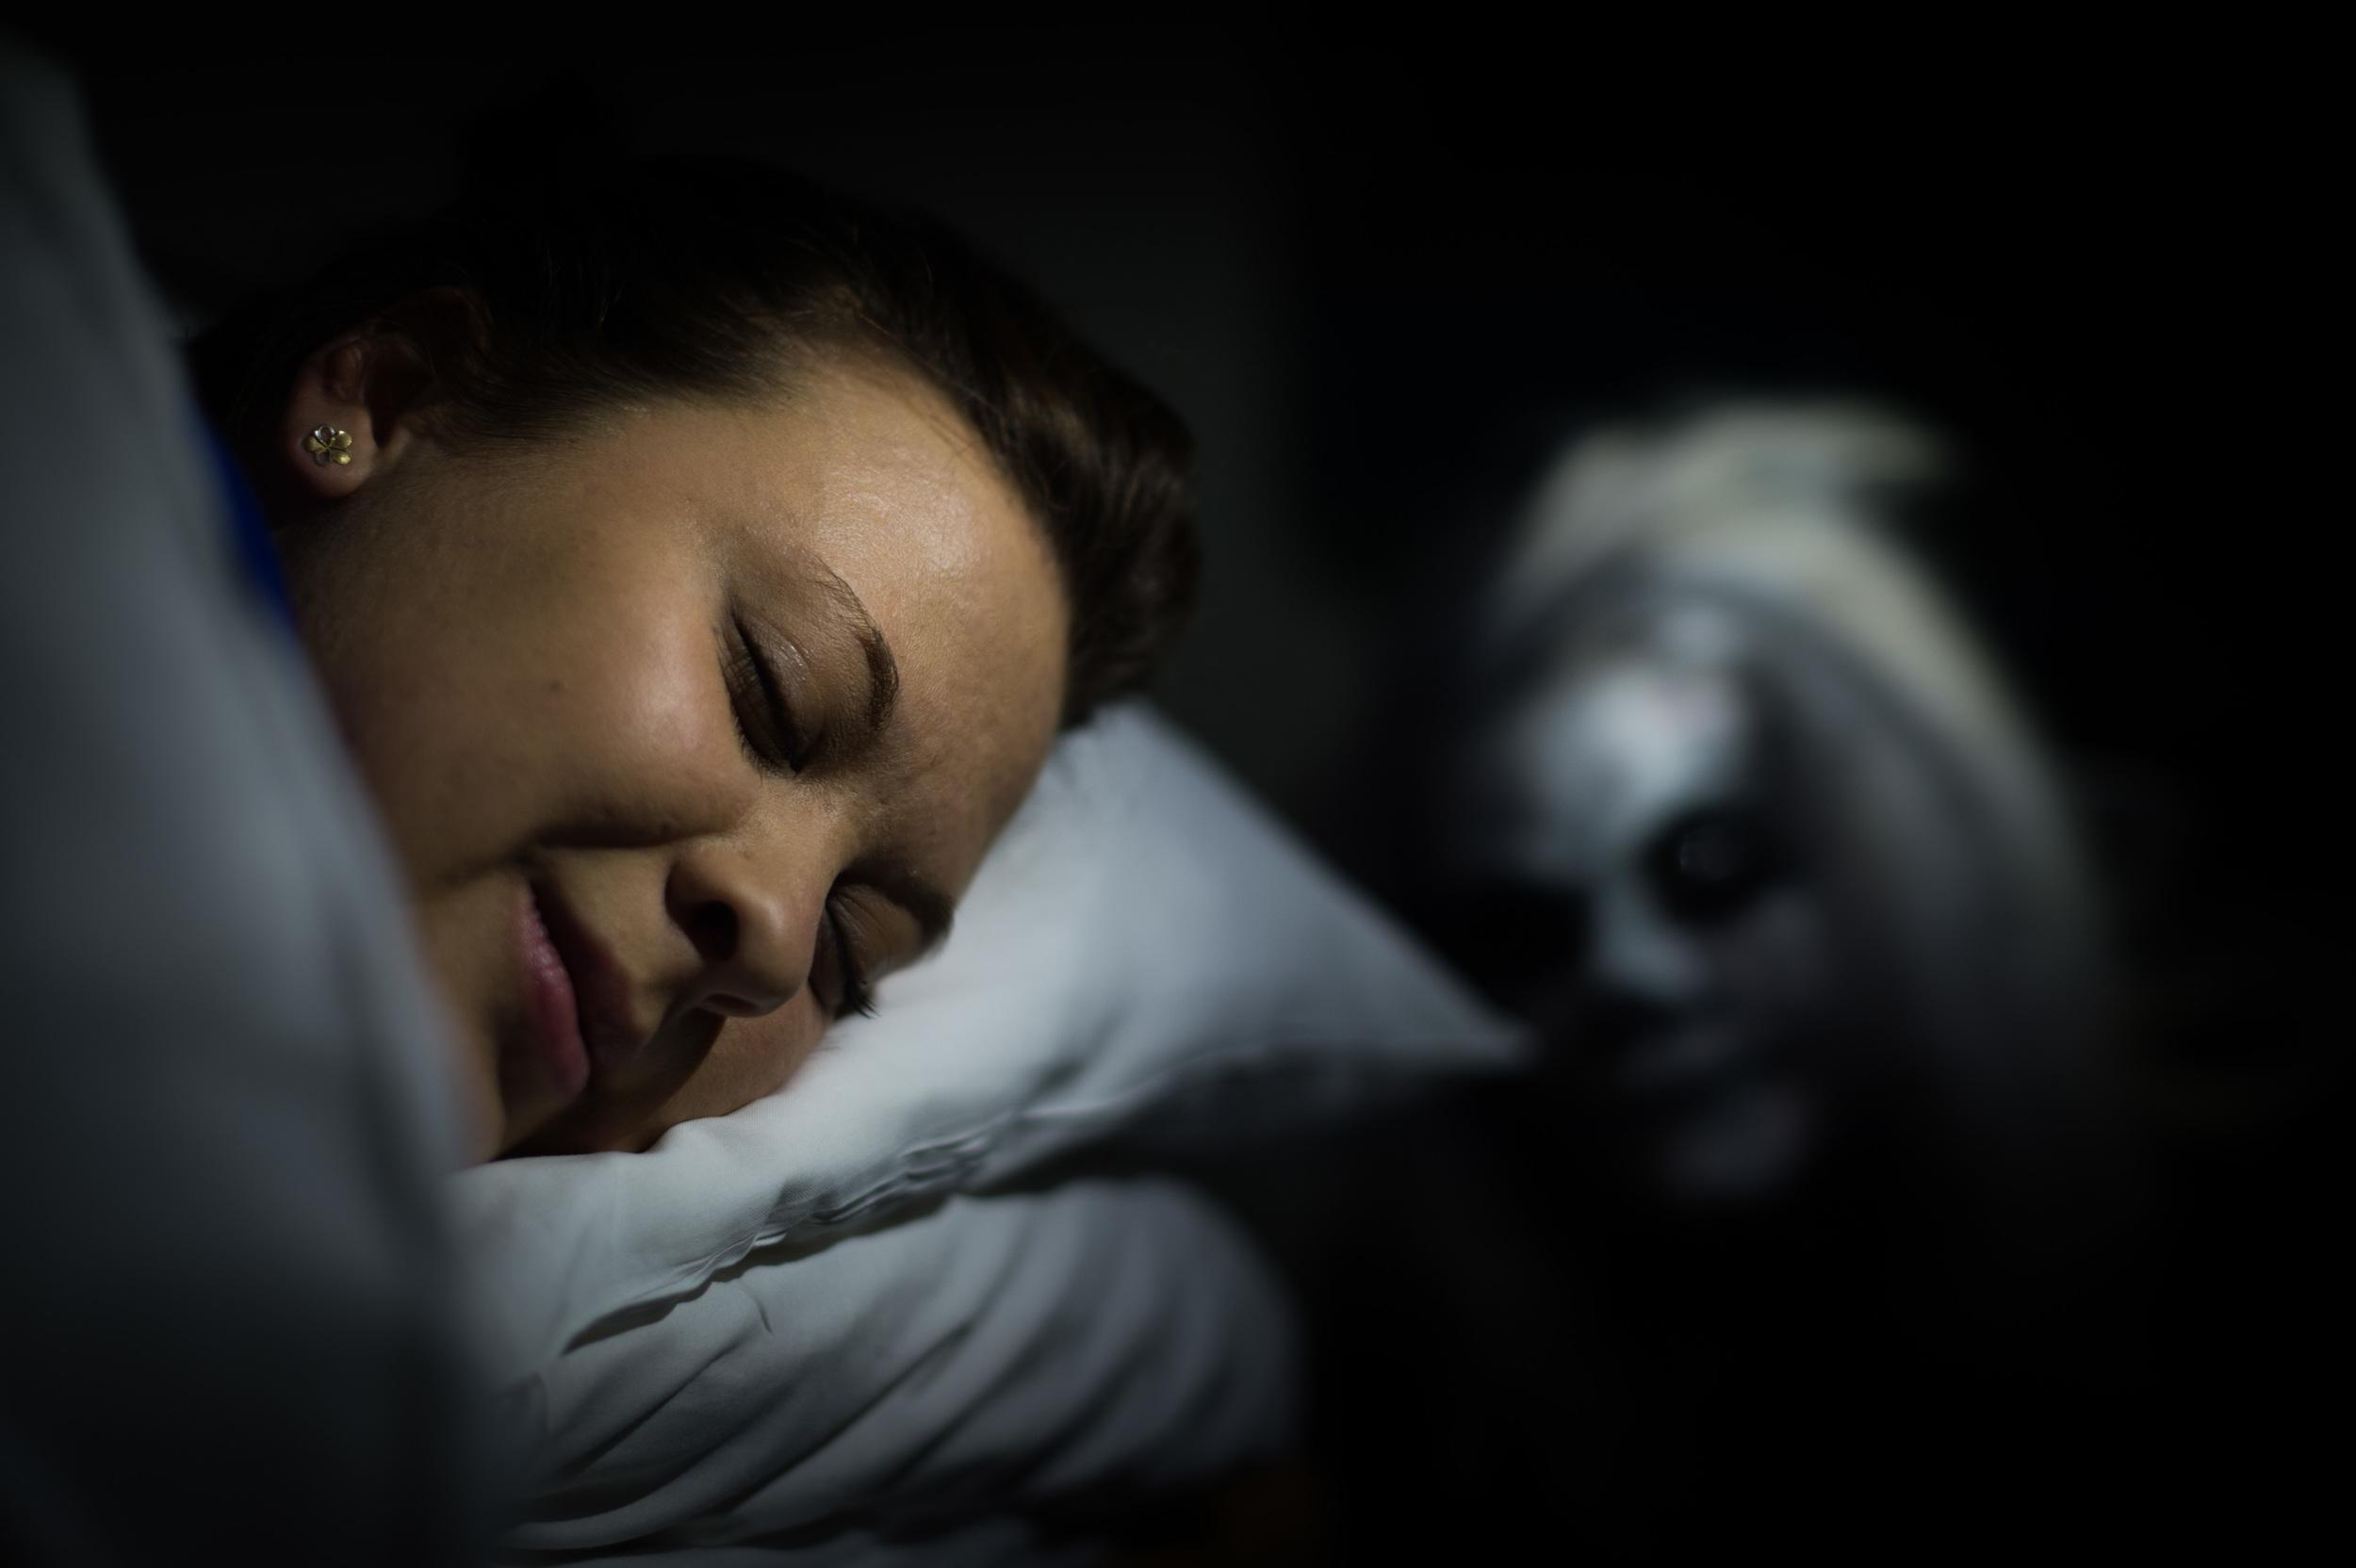 Fright_Night-93.jpg